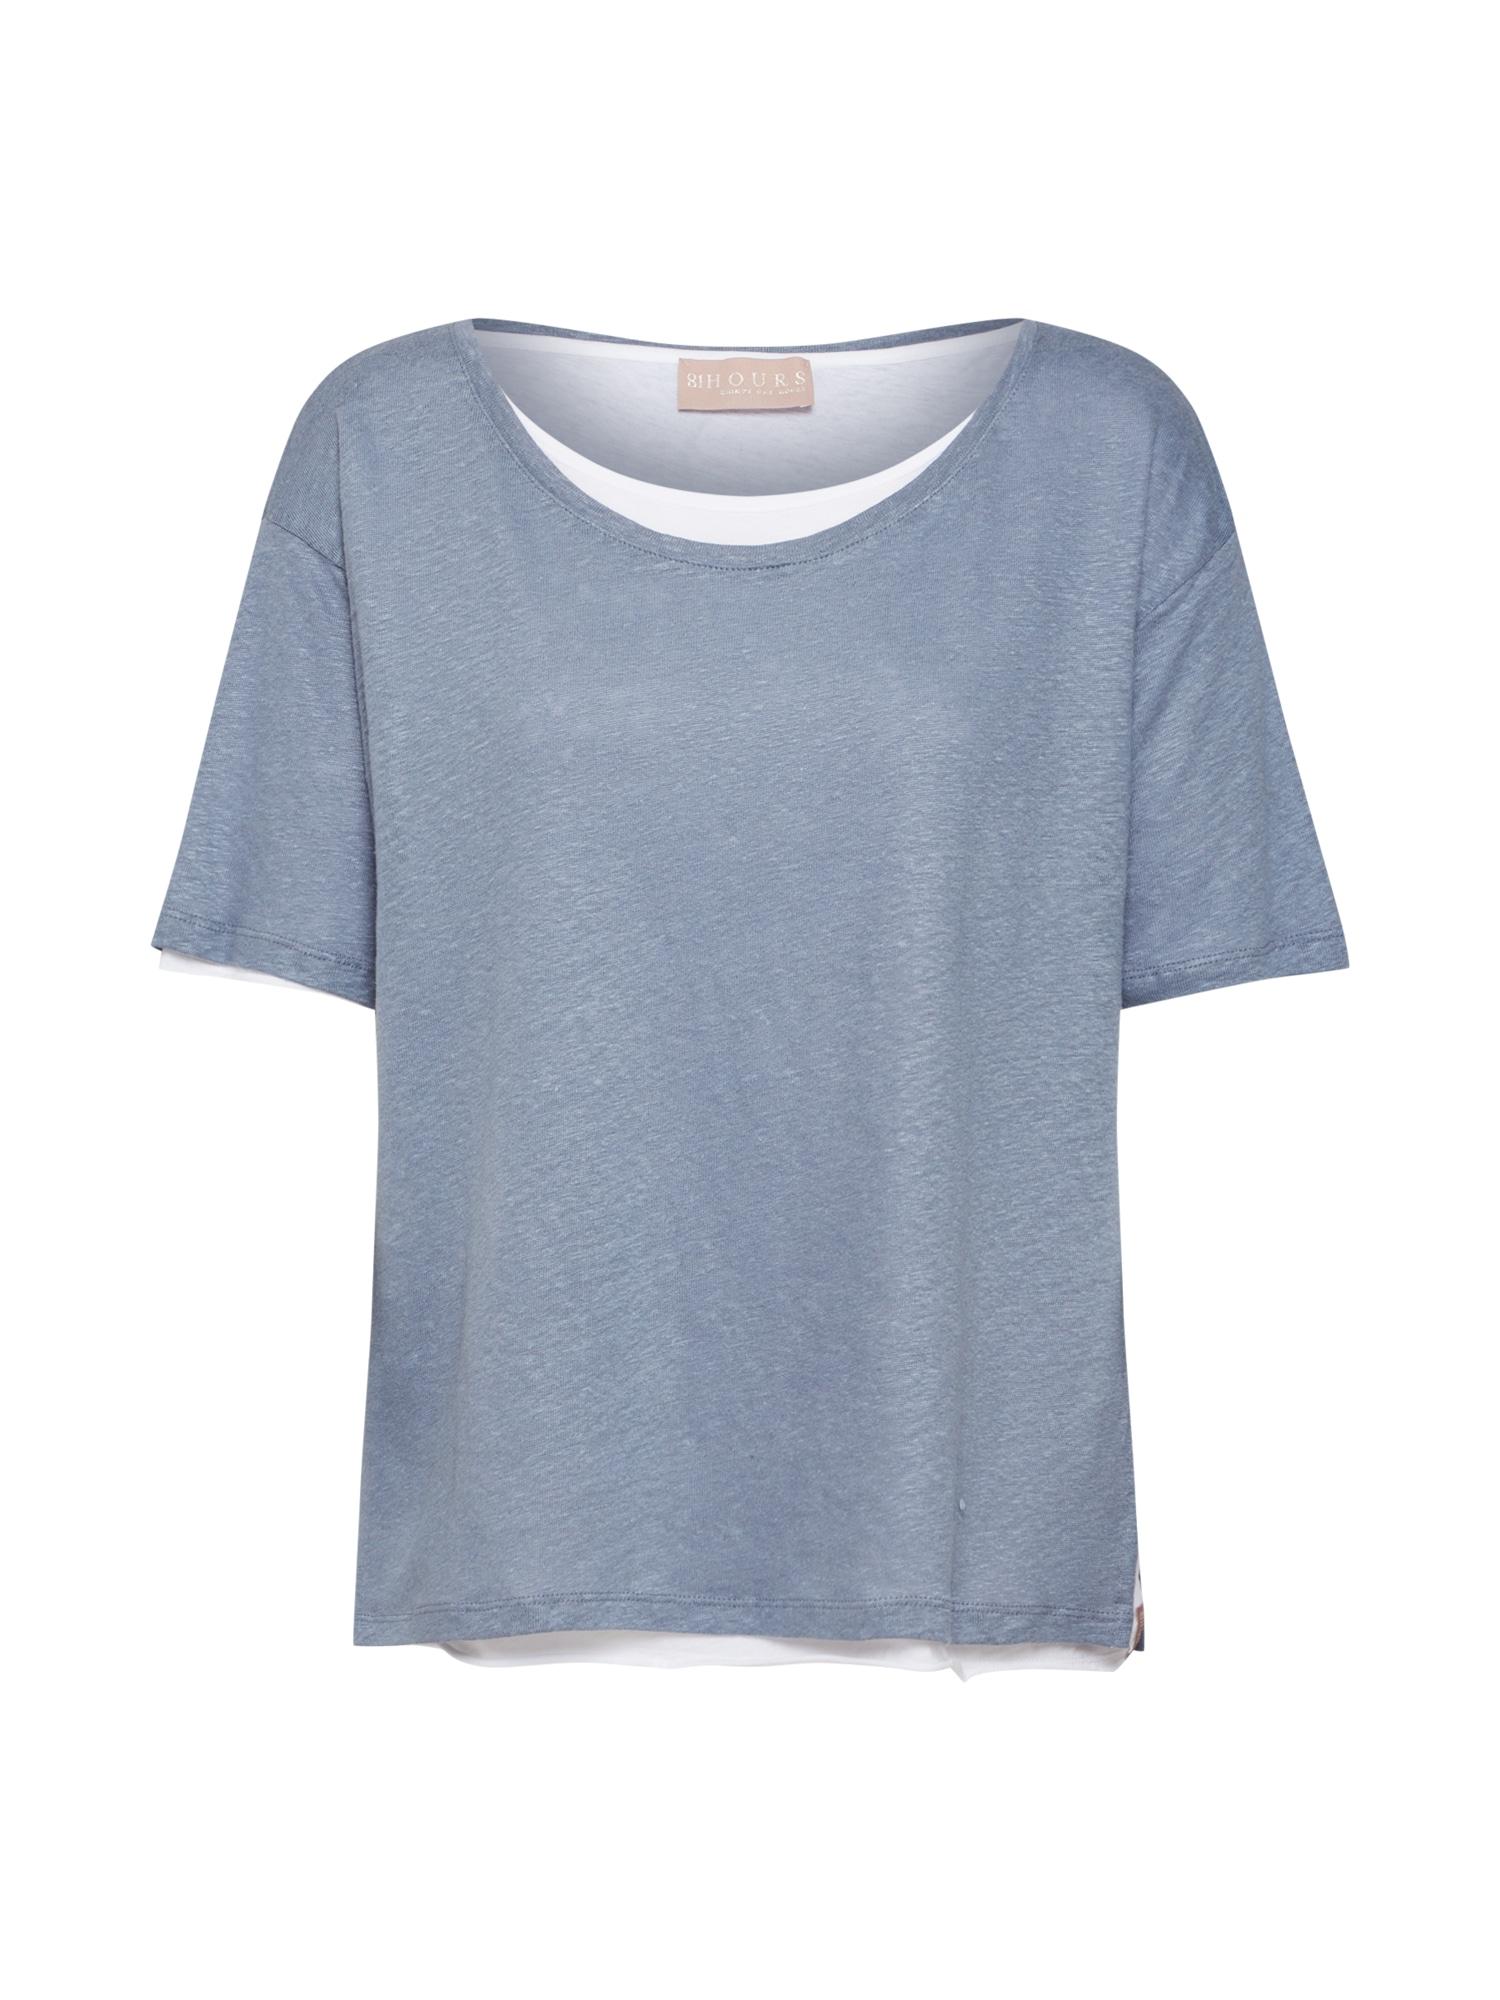 Tričko Pauletta modrý melír 81HOURS